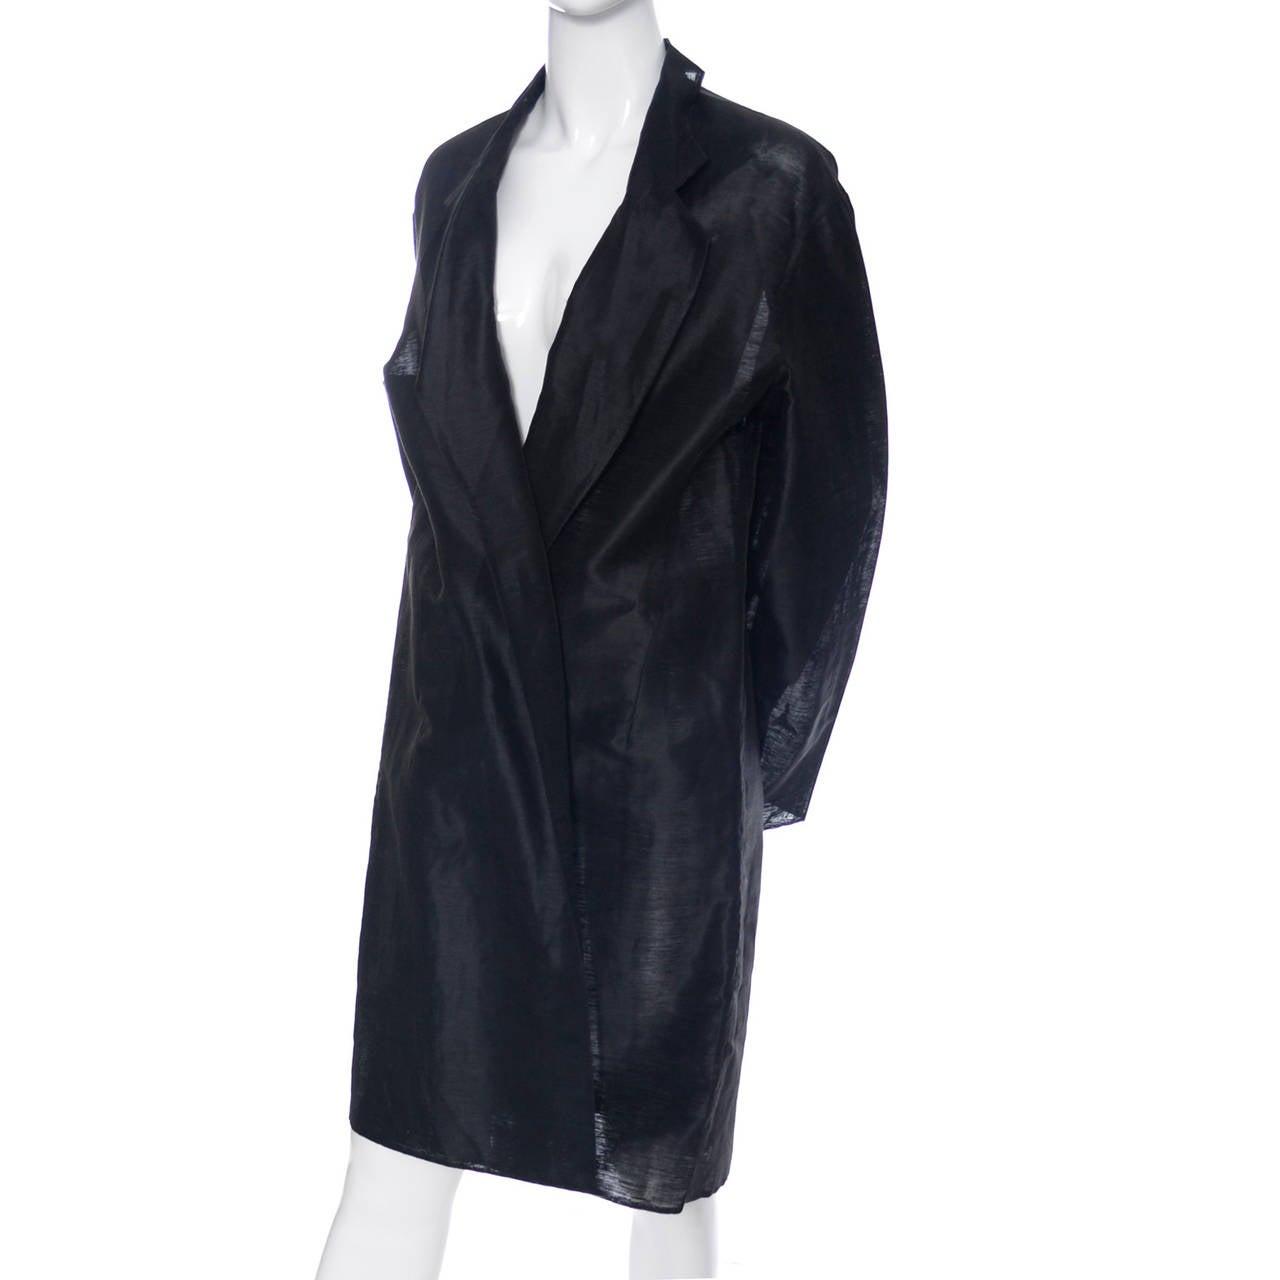 Donna Karan New York Black Label Linen Organza Evening Coat Semi Sheer 3